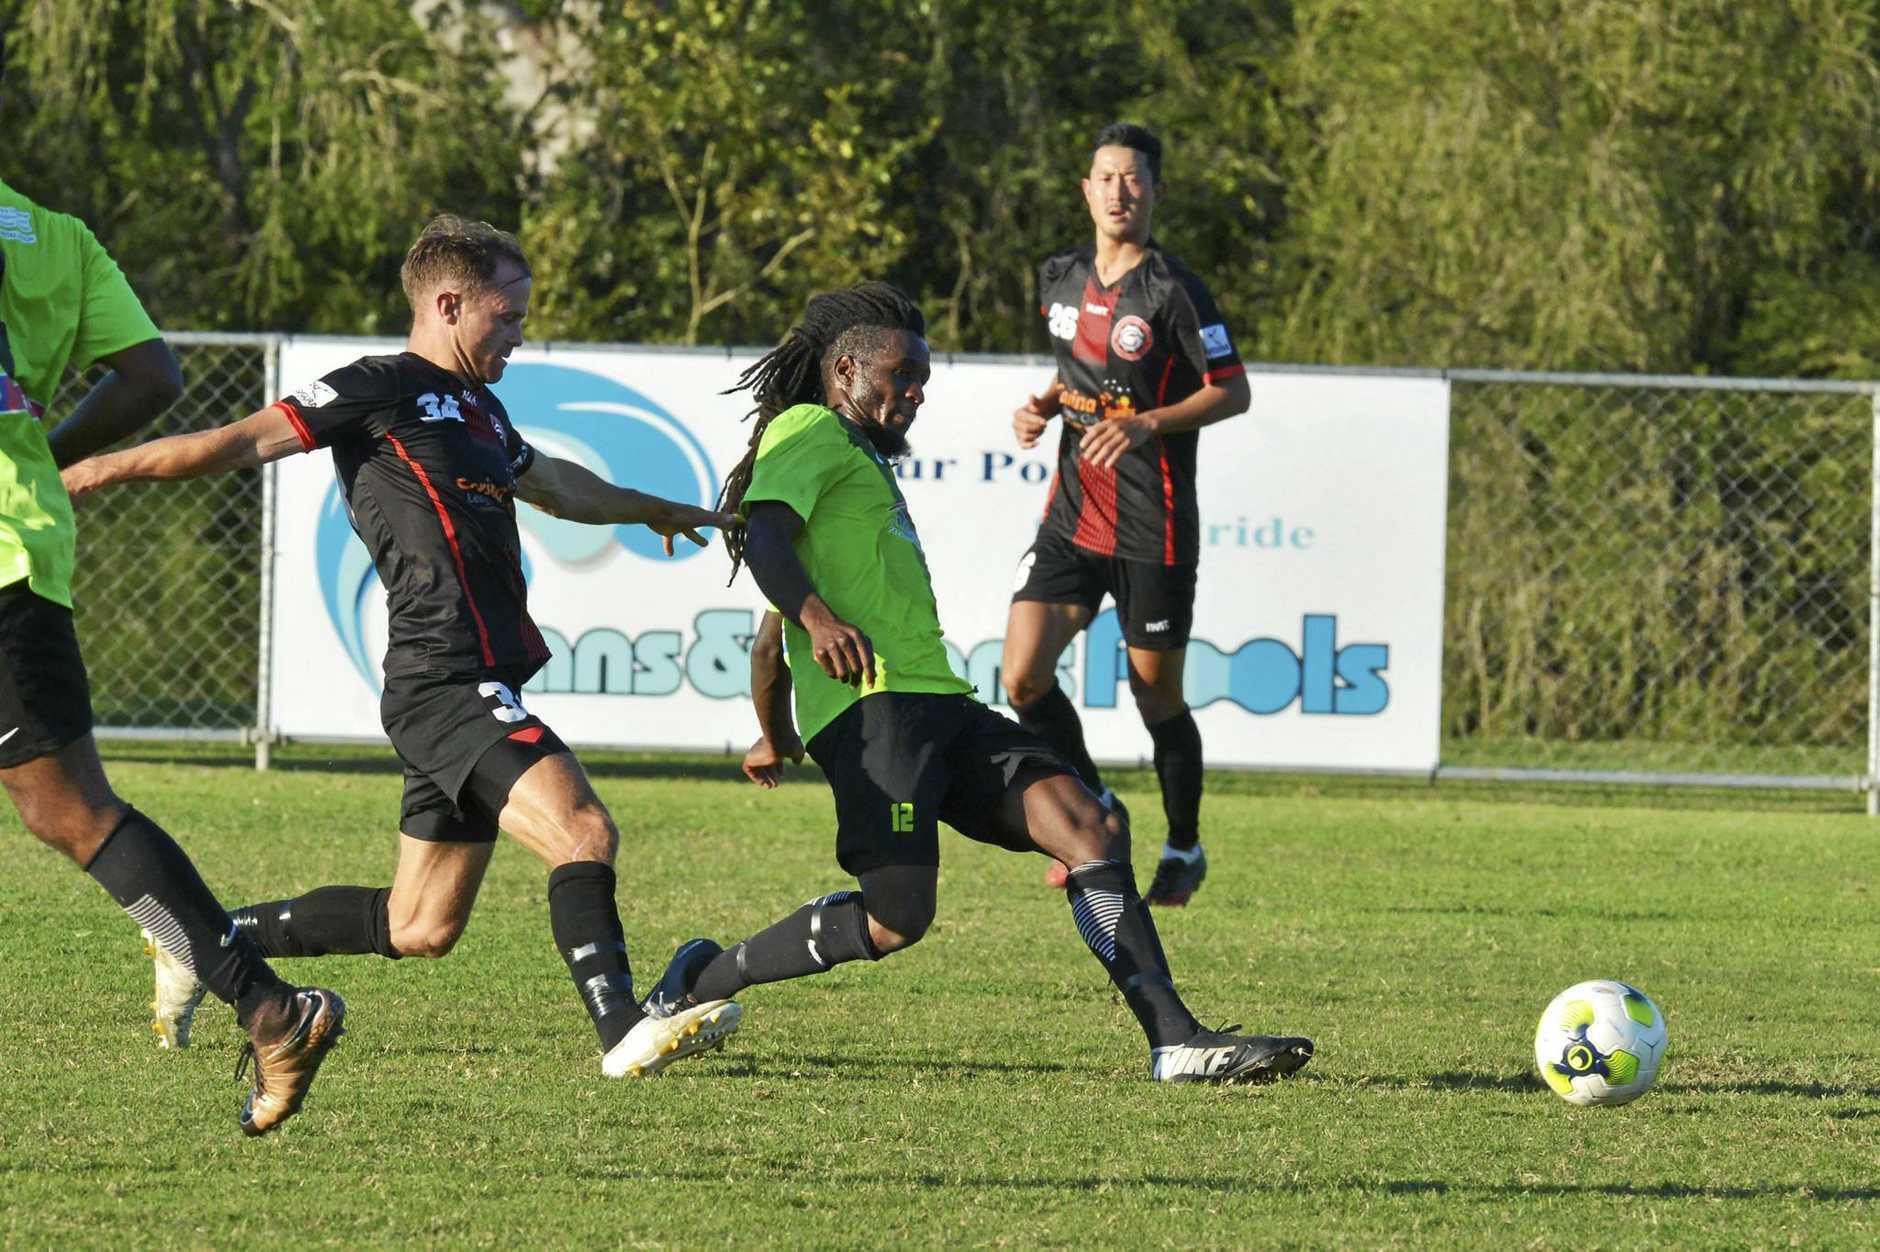 Ipswich Knights goal scorer Emmanuel Peter makes a break during a recent BPL game against Holland Park.